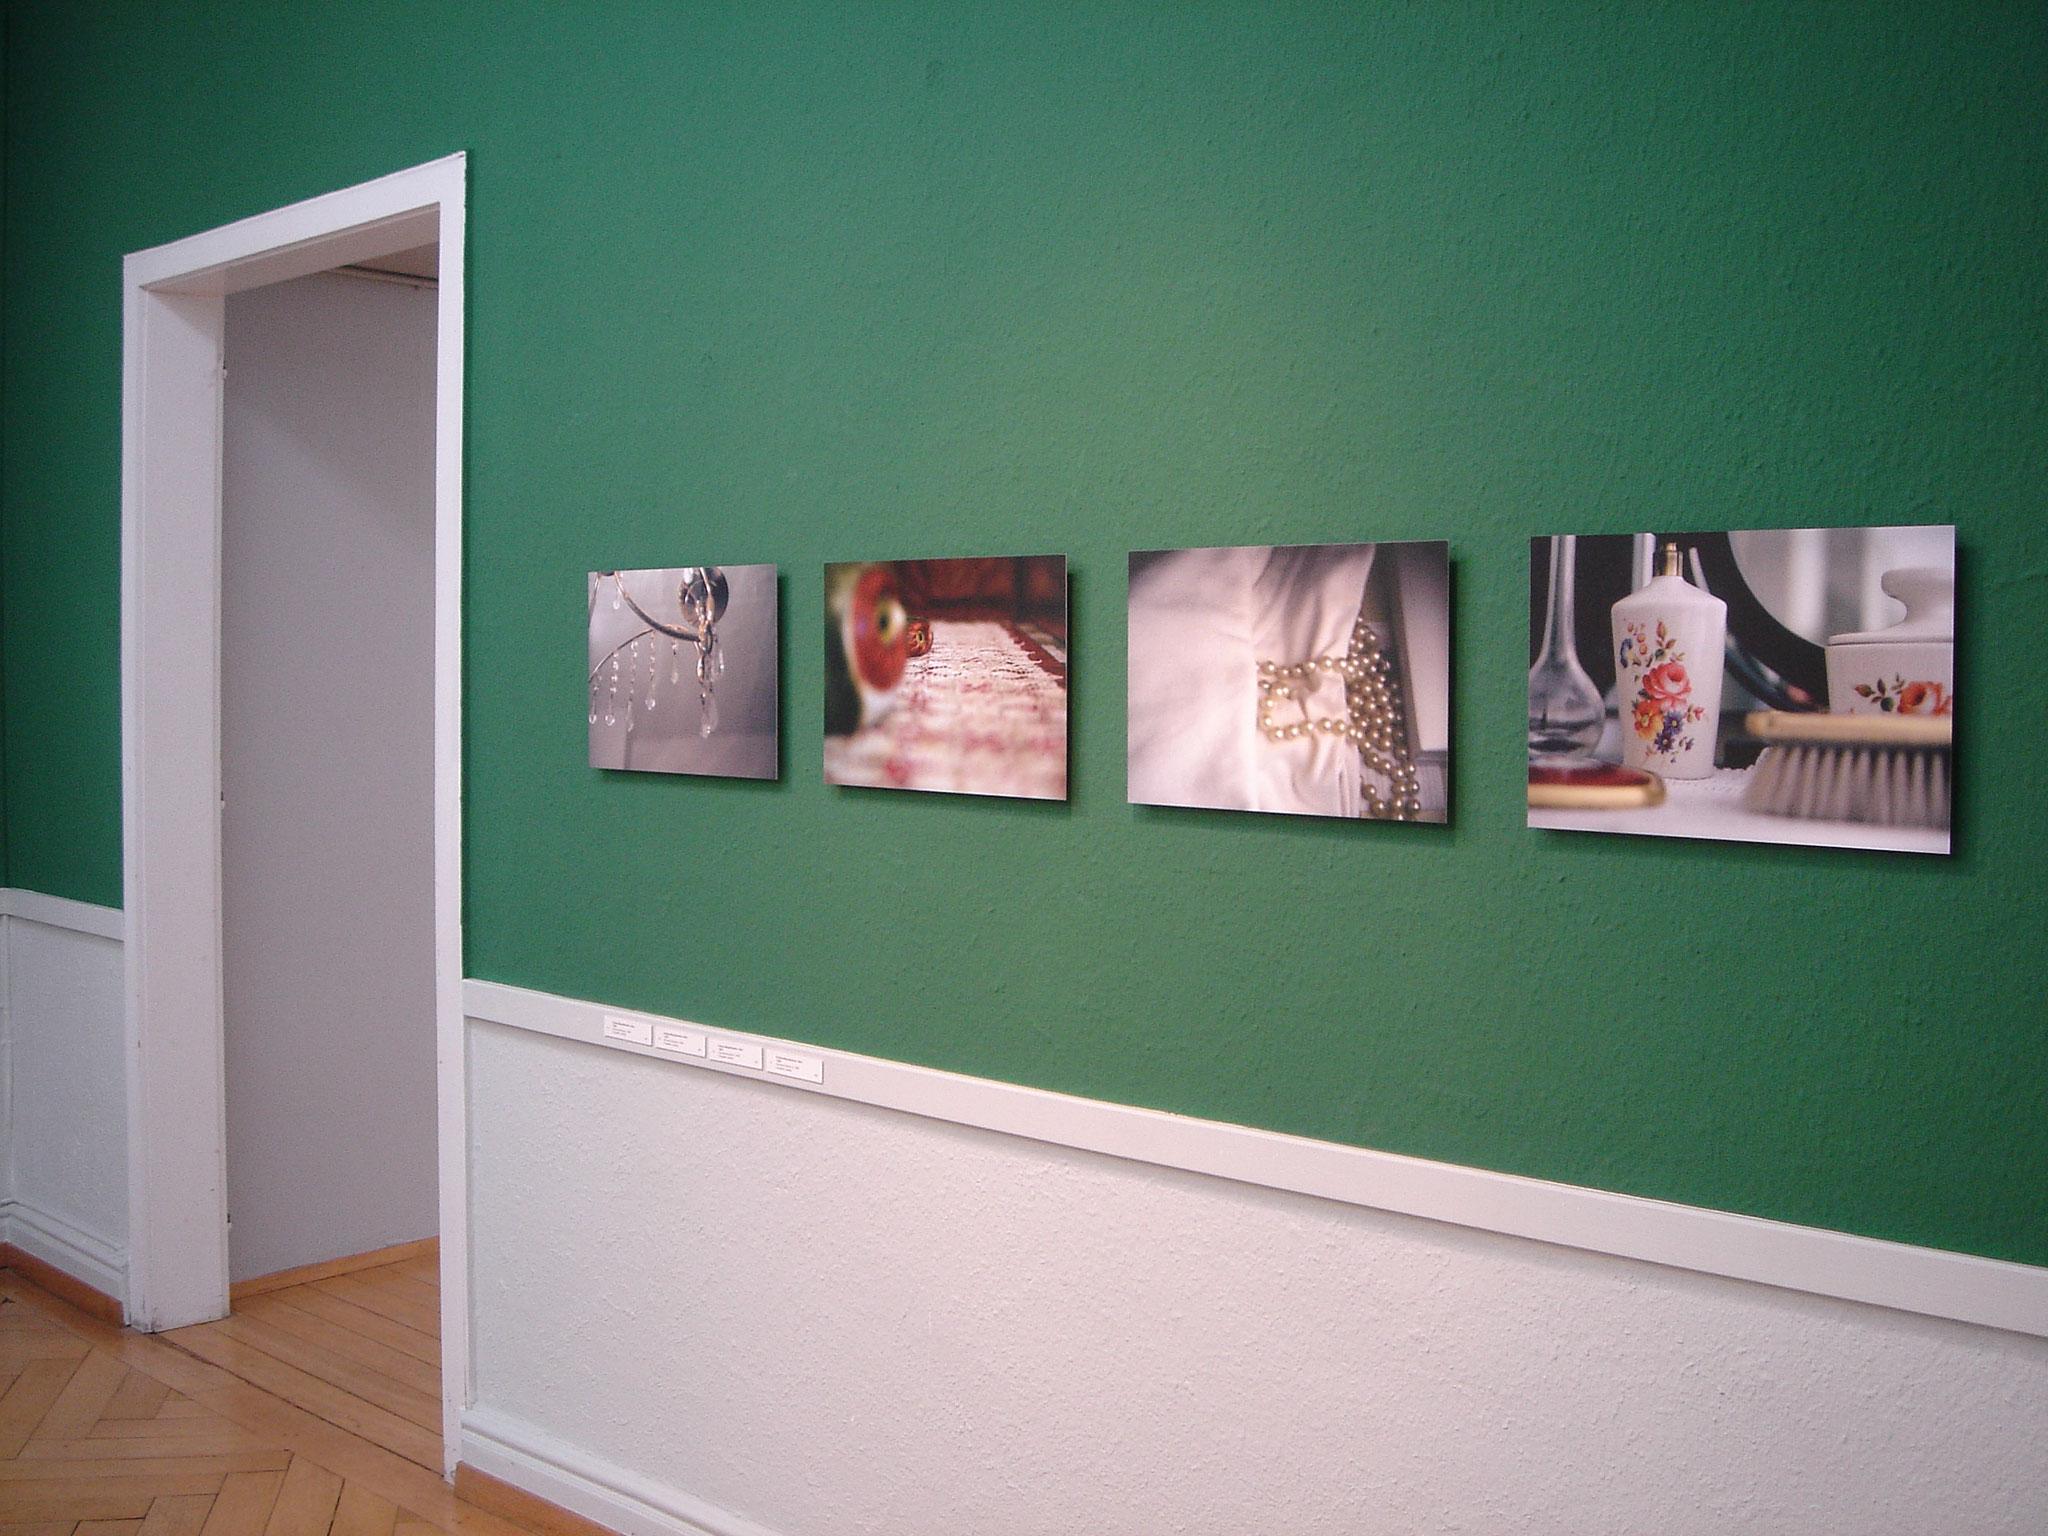 Orte des Herzens; 2007; Analogfotografie; 30,5 x 45 cm